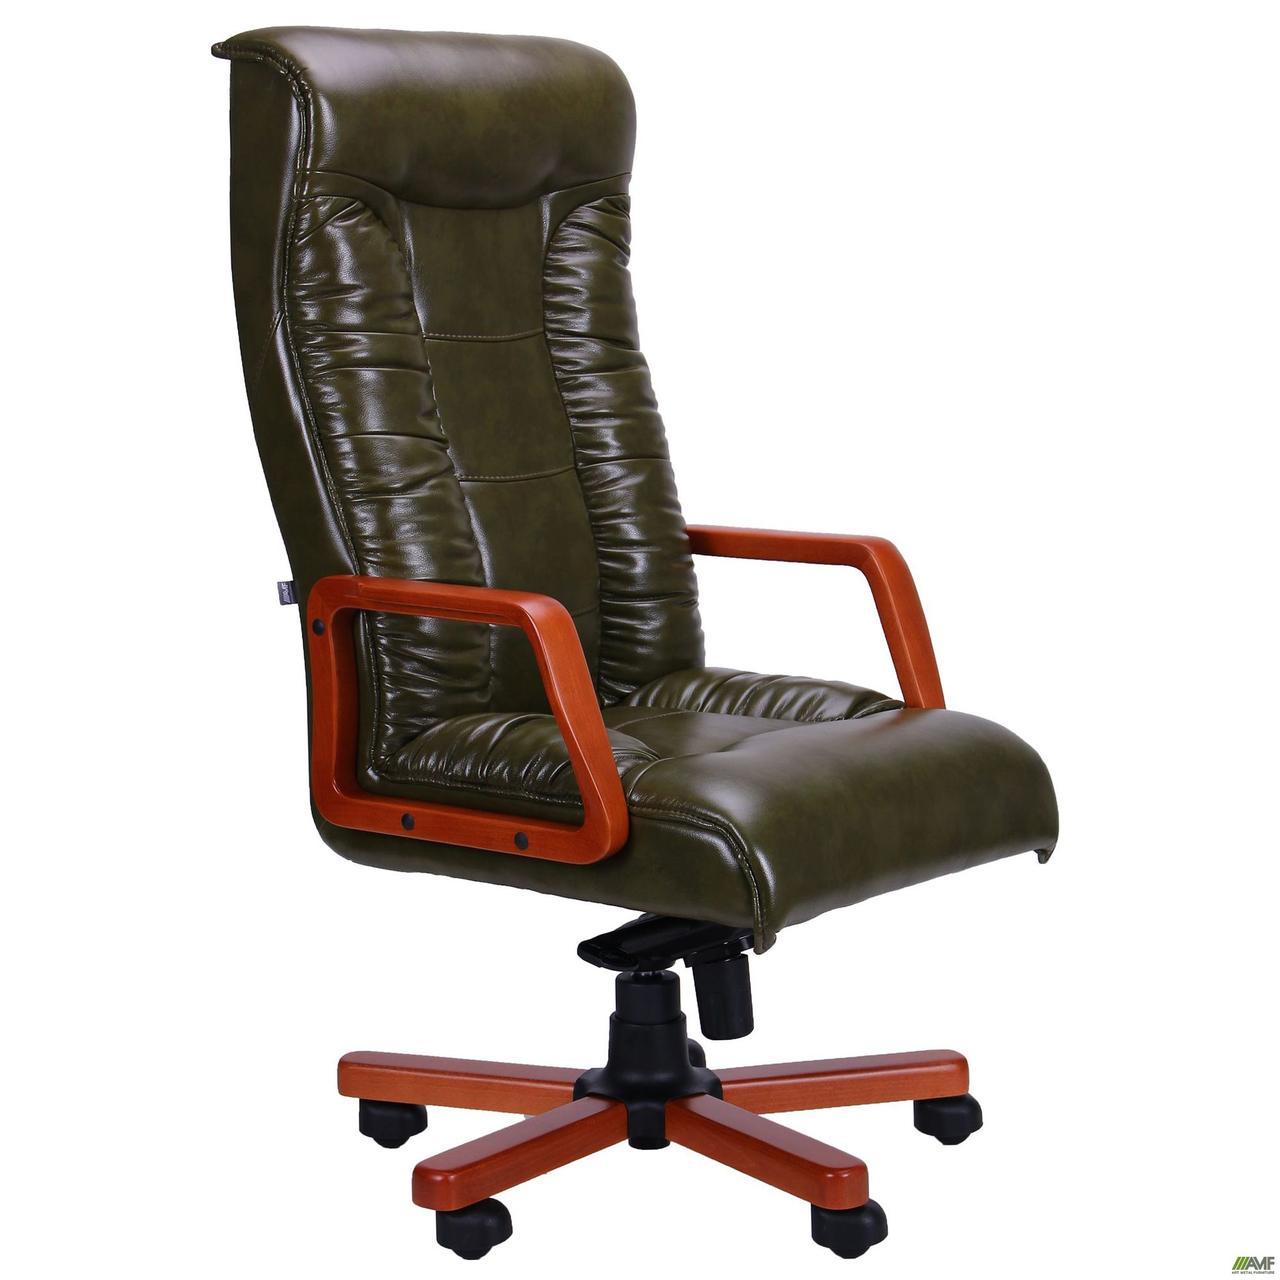 Кресло Кинг Экстра MB вишня Неаполь N-77